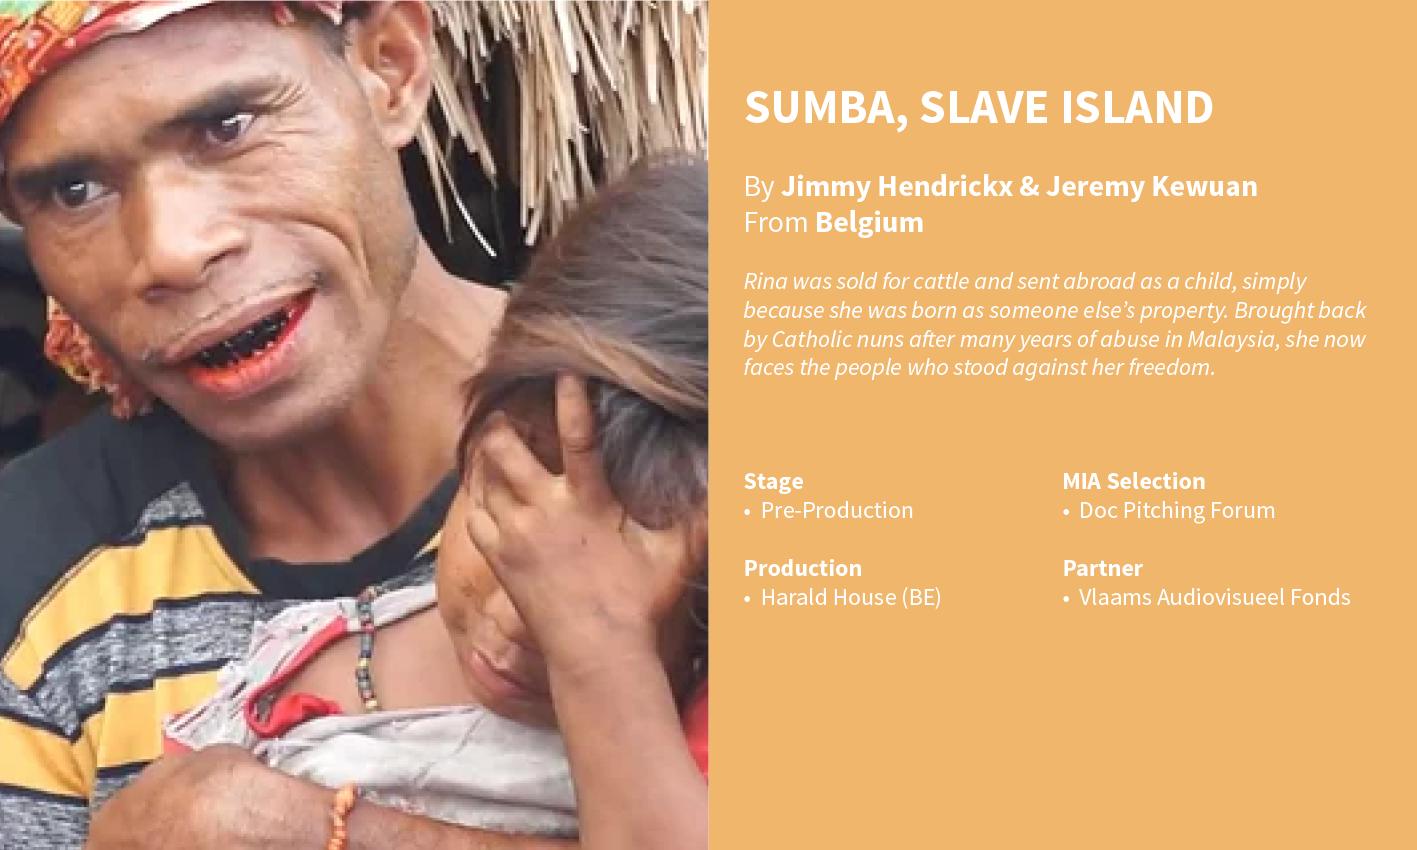 Sumba, Slave Island